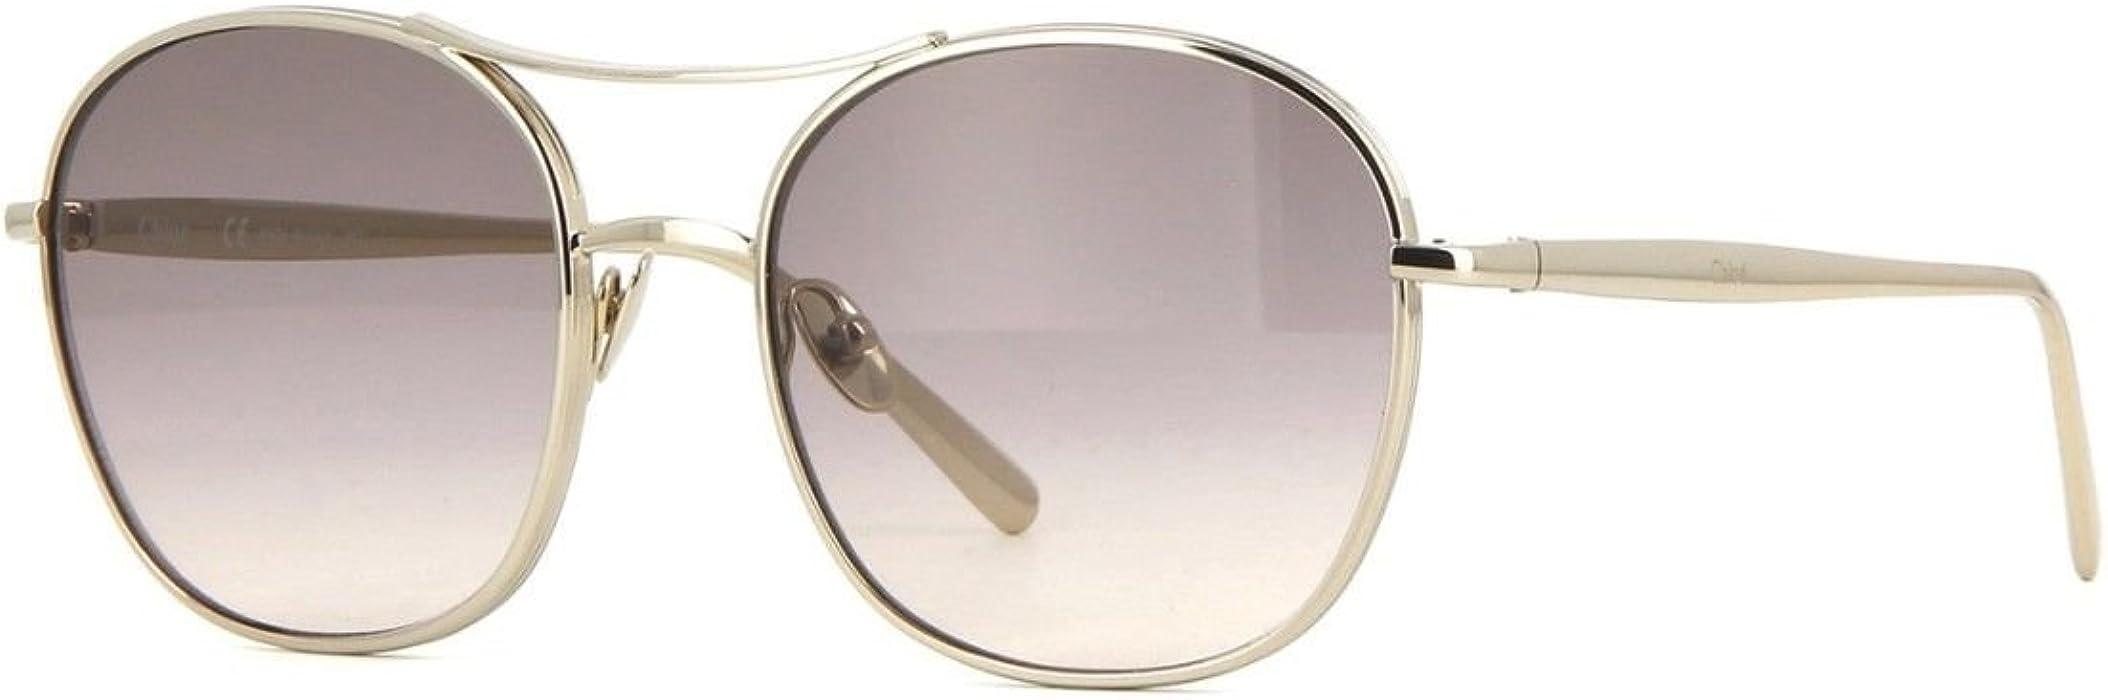 Chloé Ce137S 767 54, Gafas de Sol para Mujer, Gold/Brown ...